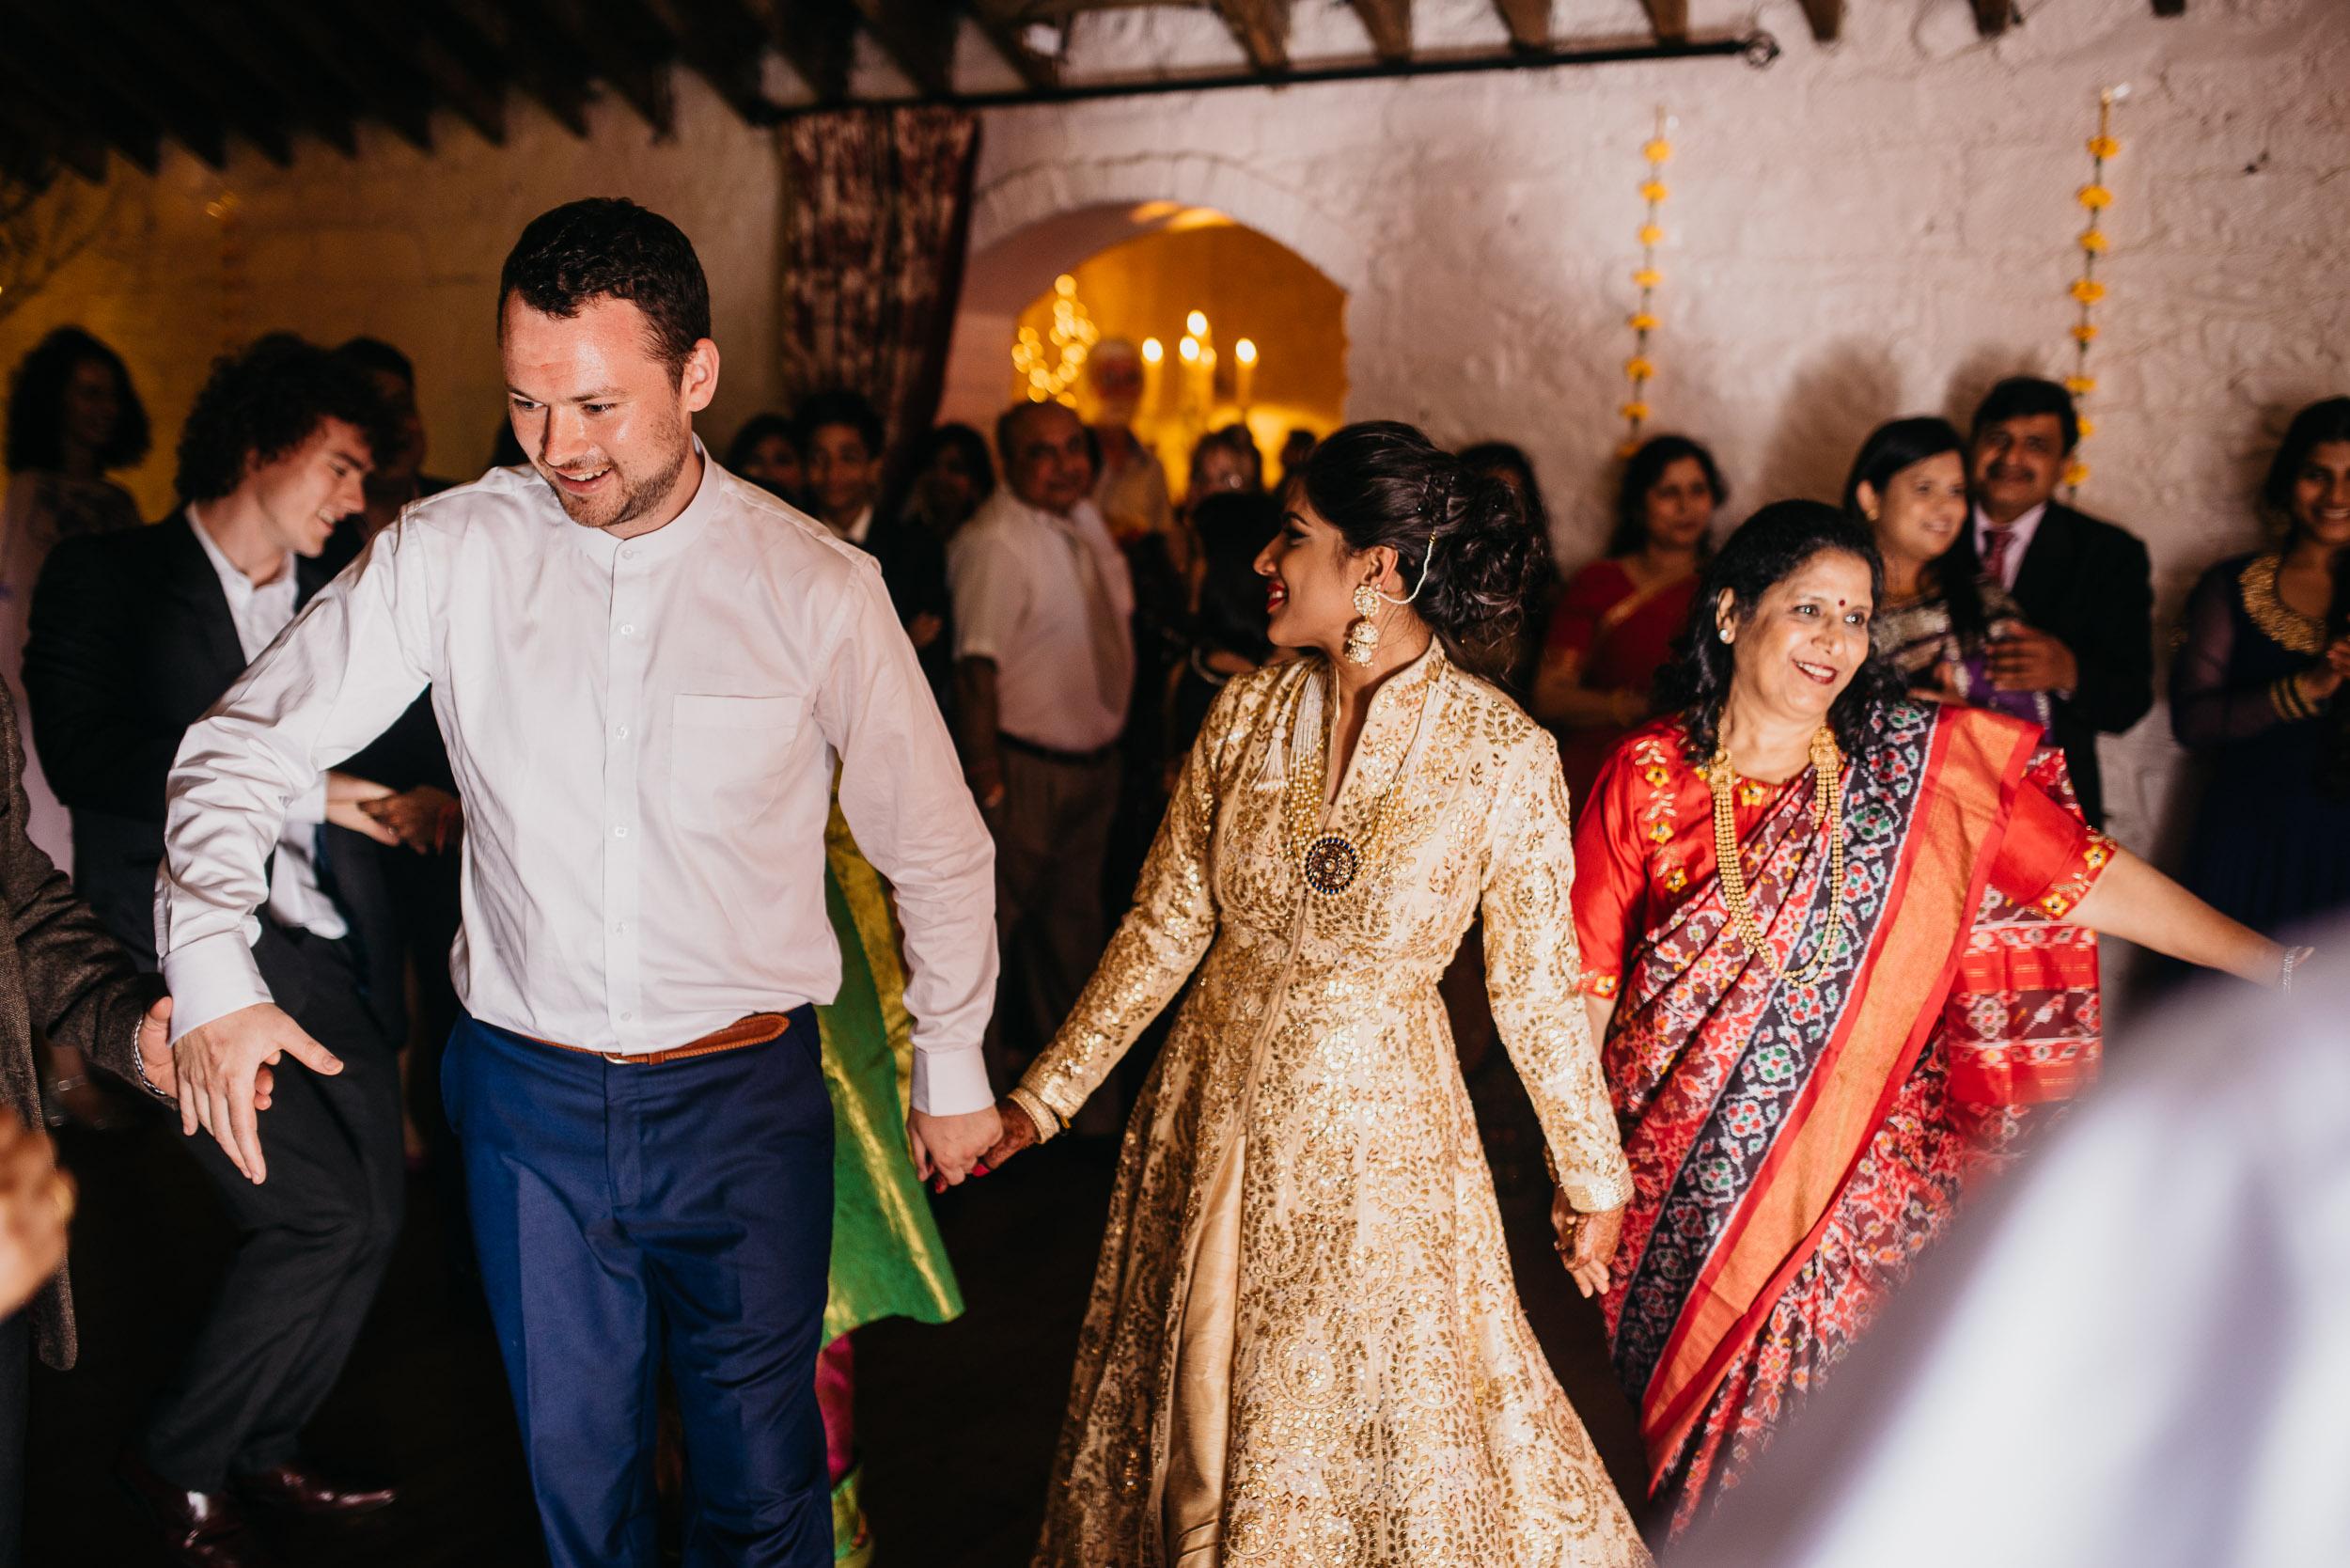 larchfield hindu wedding northern ireland-162.jpg